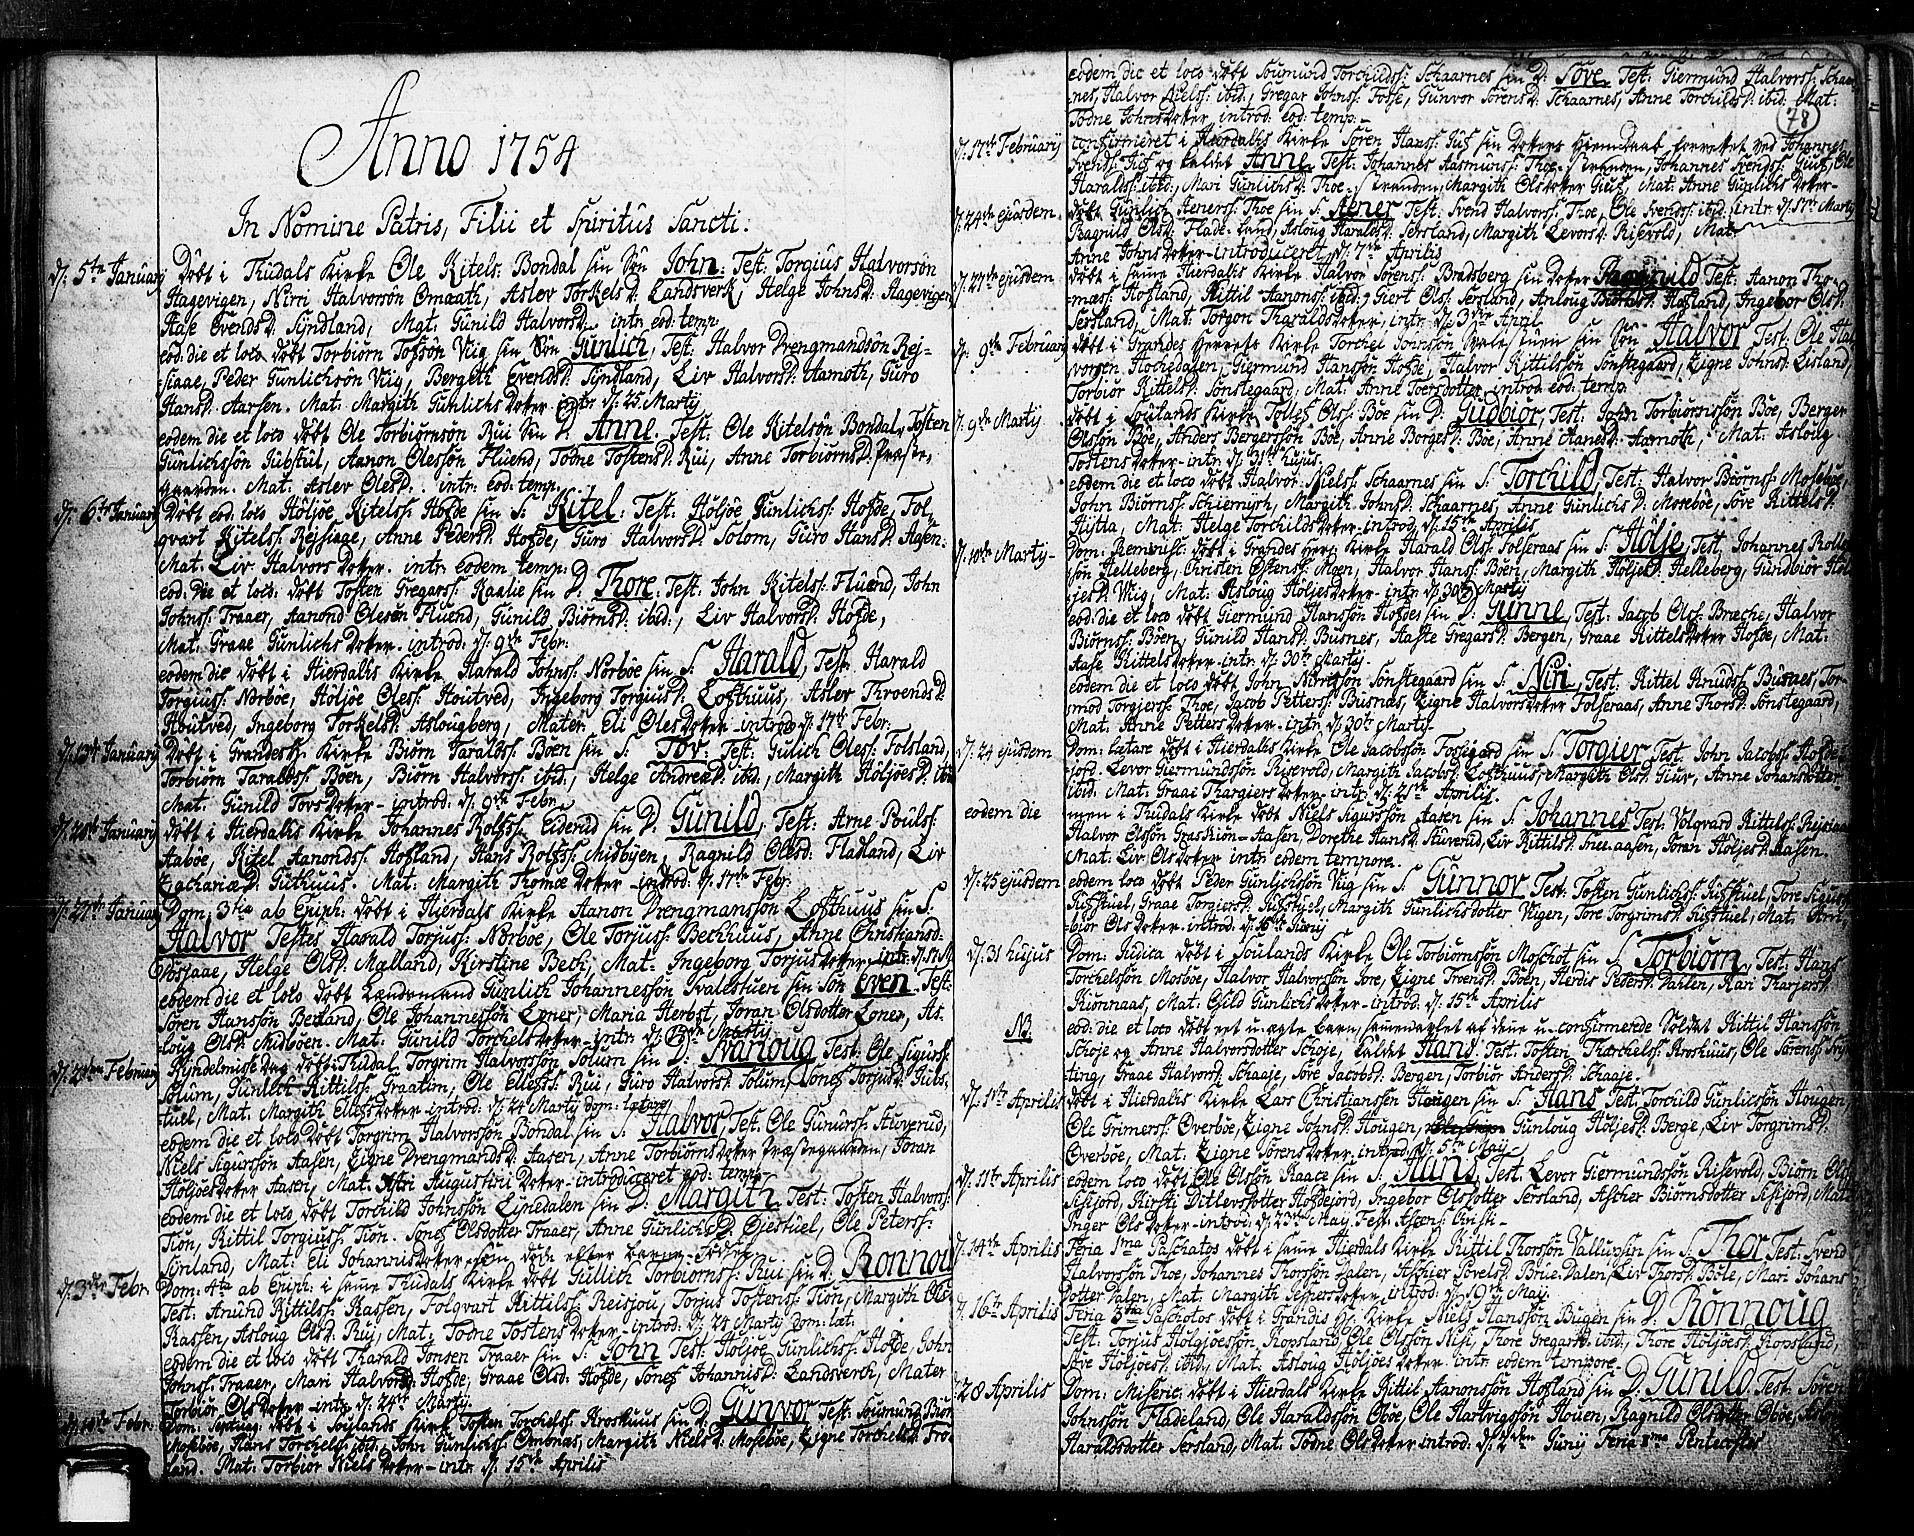 SAKO, Hjartdal kirkebøker, F/Fa/L0003: Ministerialbok nr. I 3, 1727-1775, s. 78